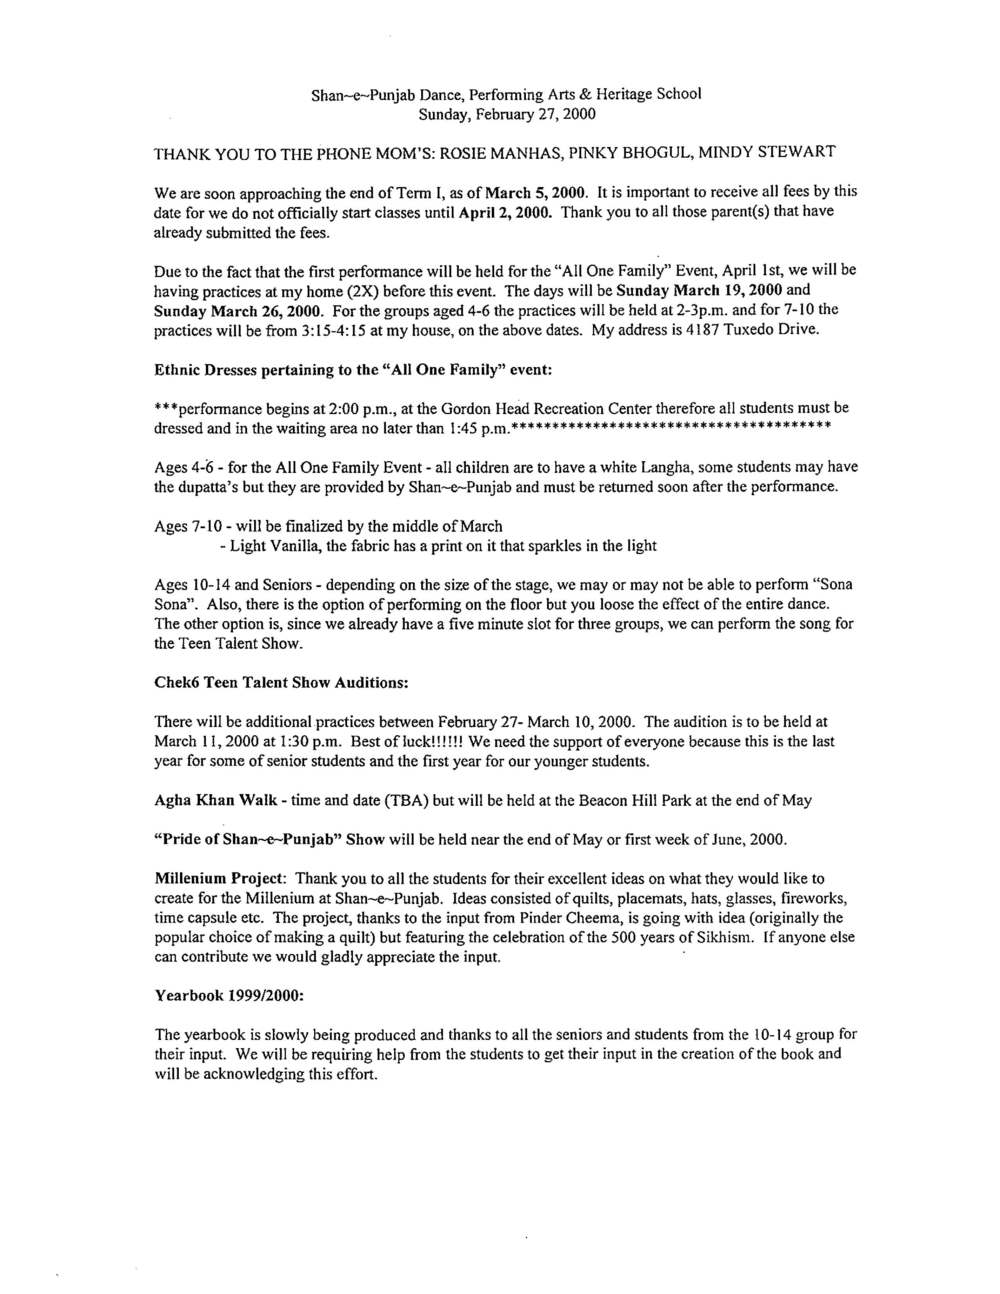 Newsletter 2000_Page_1.jpg